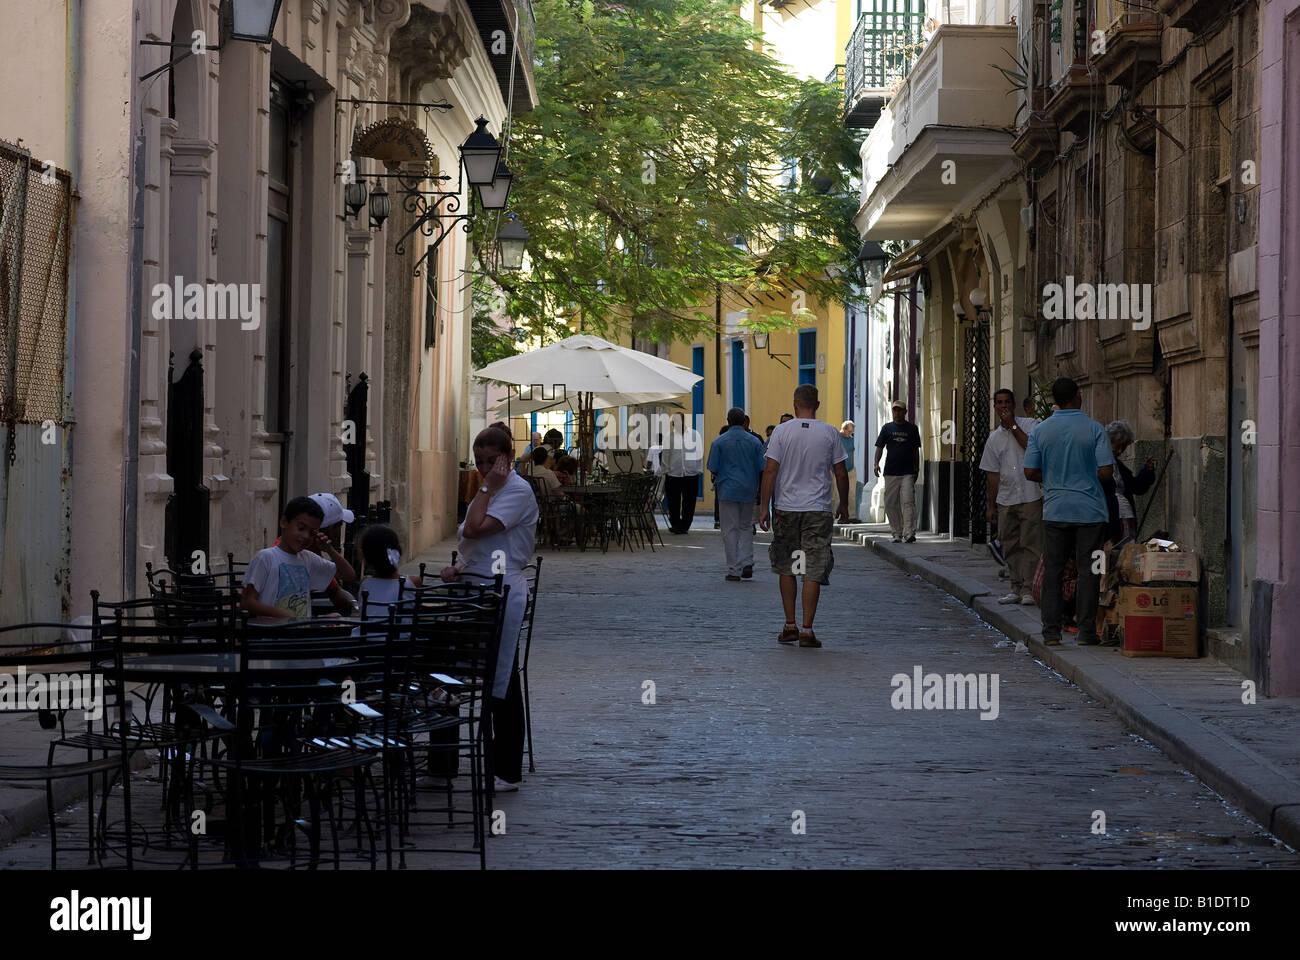 Sreet in La Habana Vieja - Stock Image